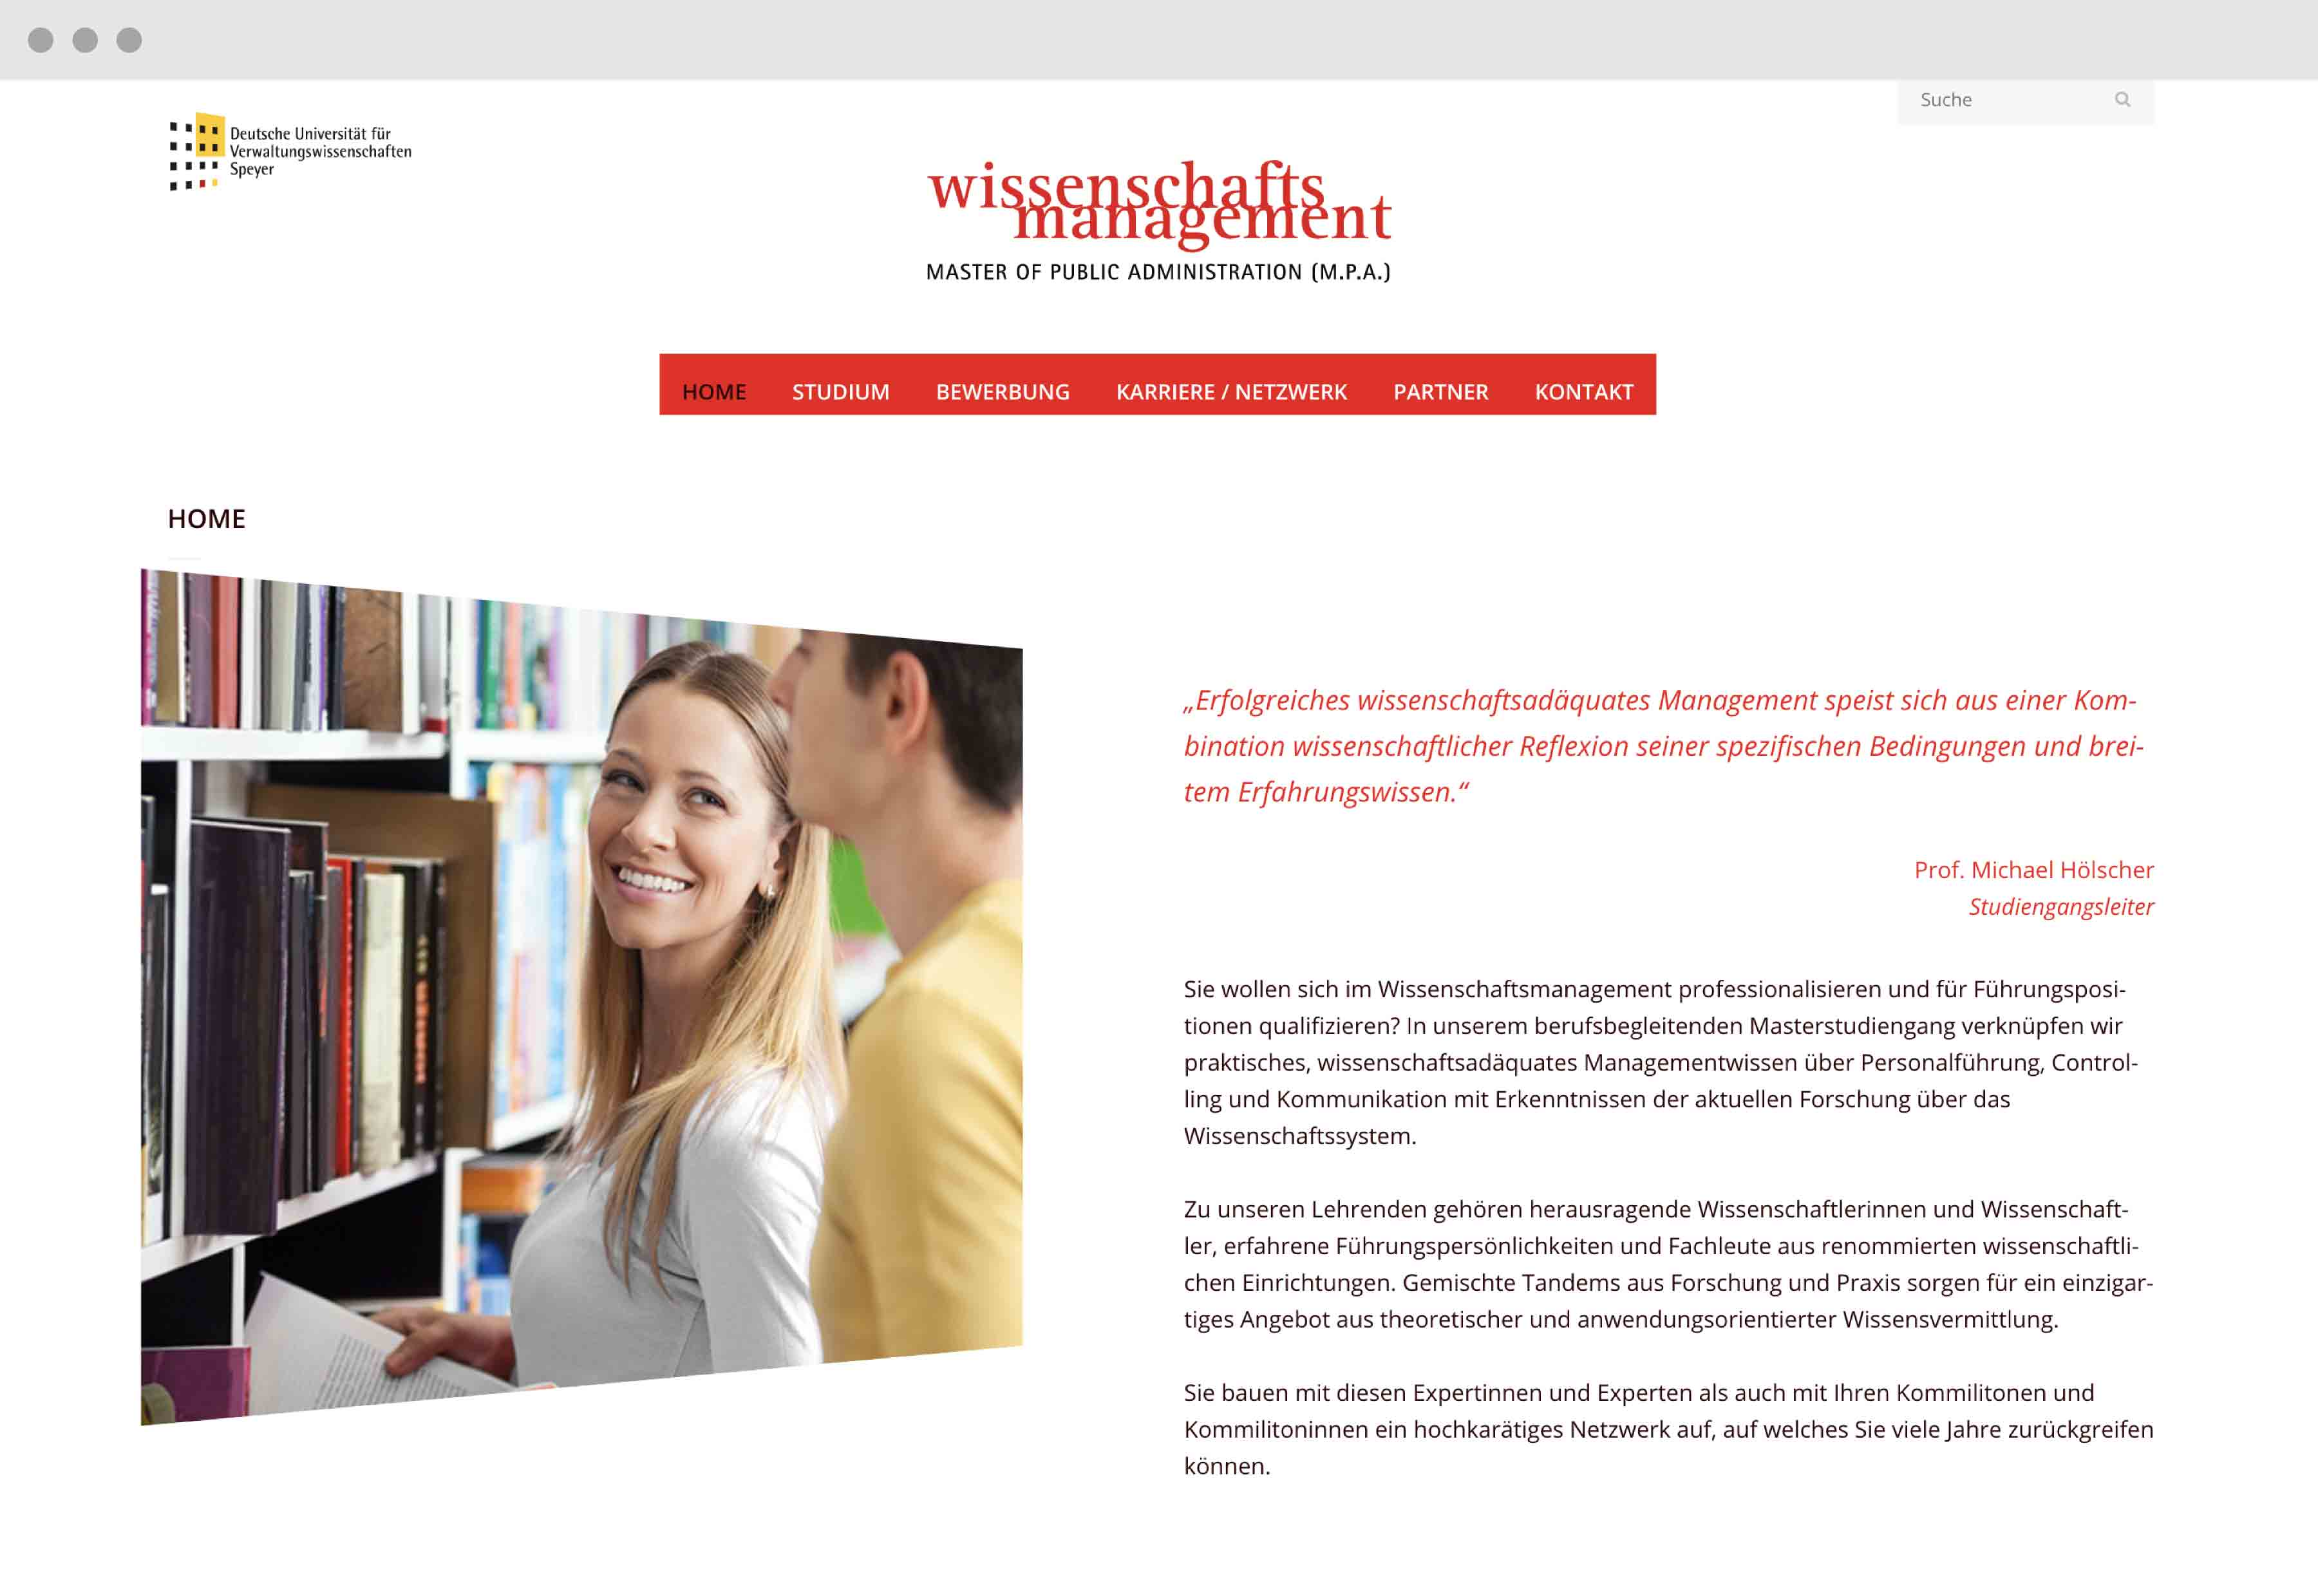 Wissenschaftsmanagement M.P.A. Screendesign